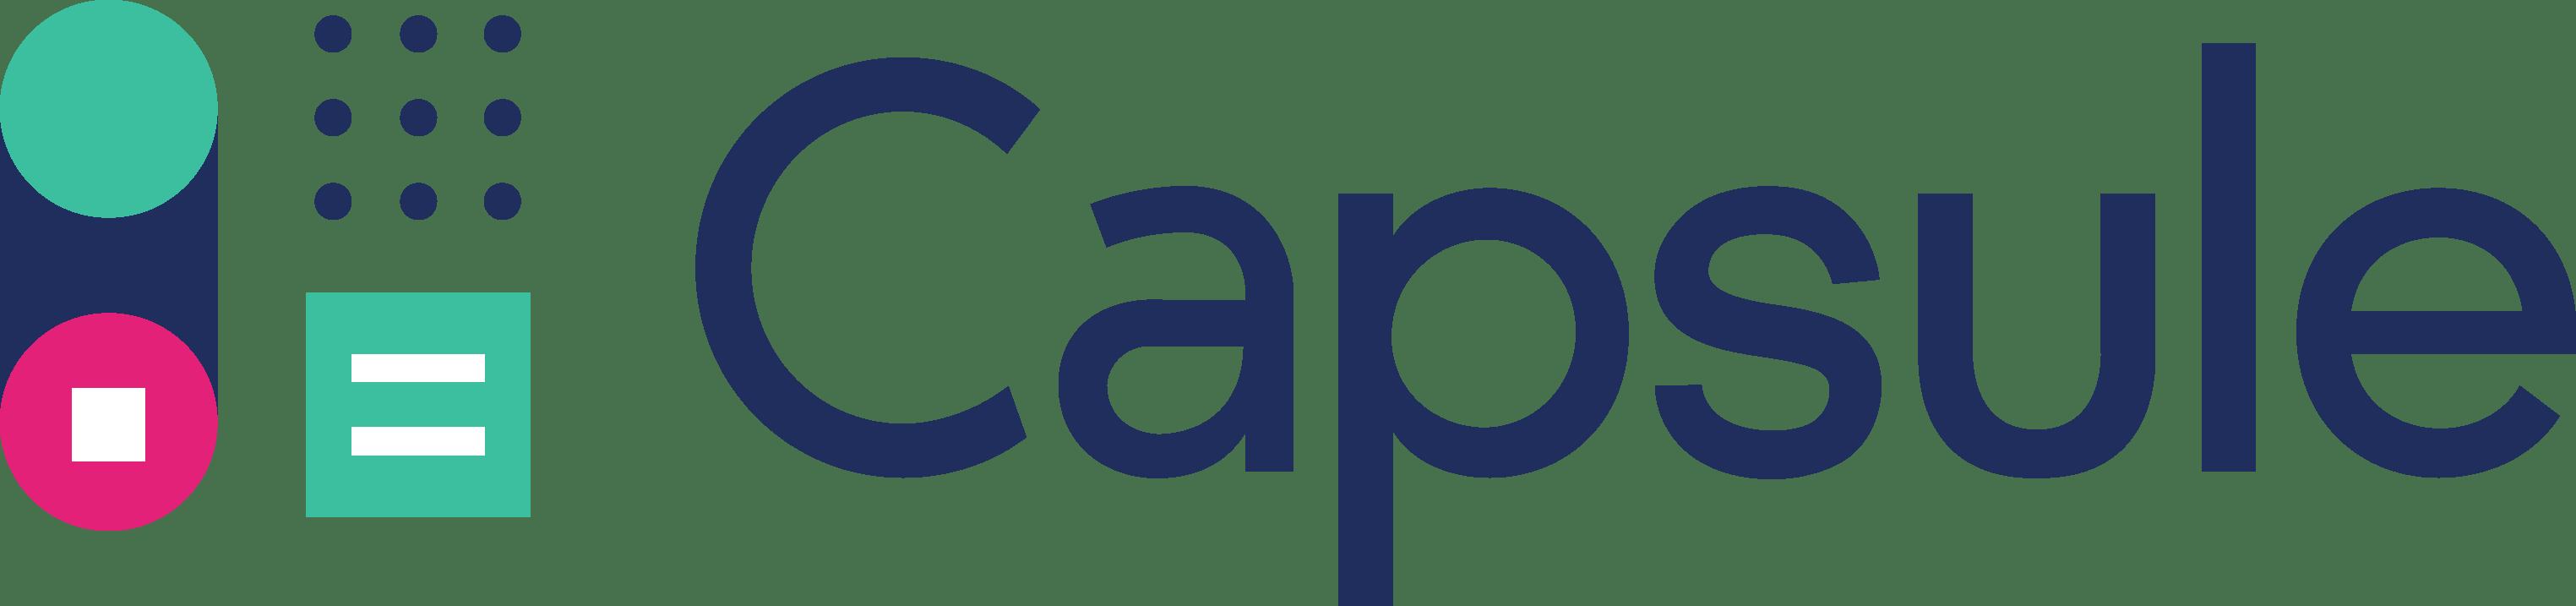 Capsule CRM Logo png